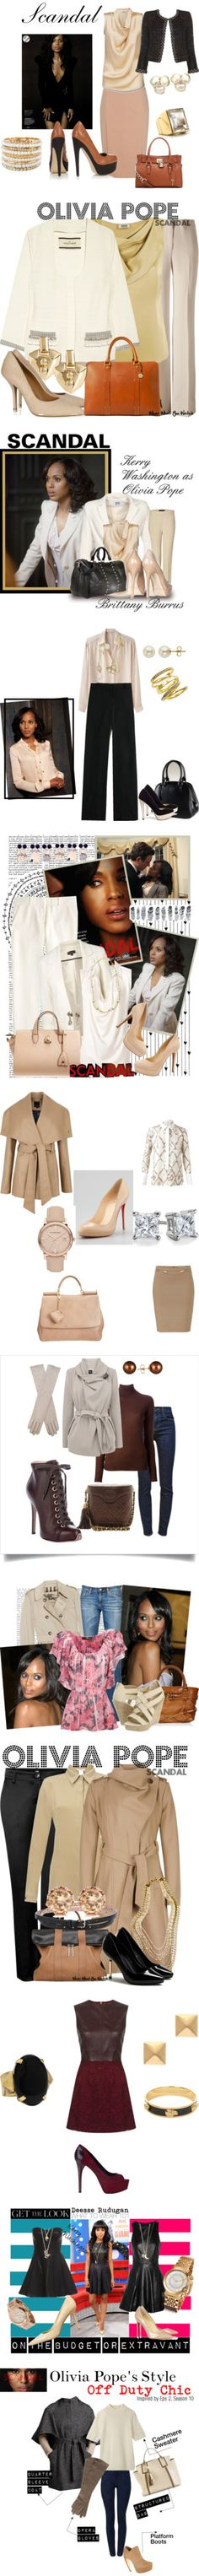 """Kerry Washington (Olivia Pope) Styles"" by fashionexplorer-890 on Polyvore"